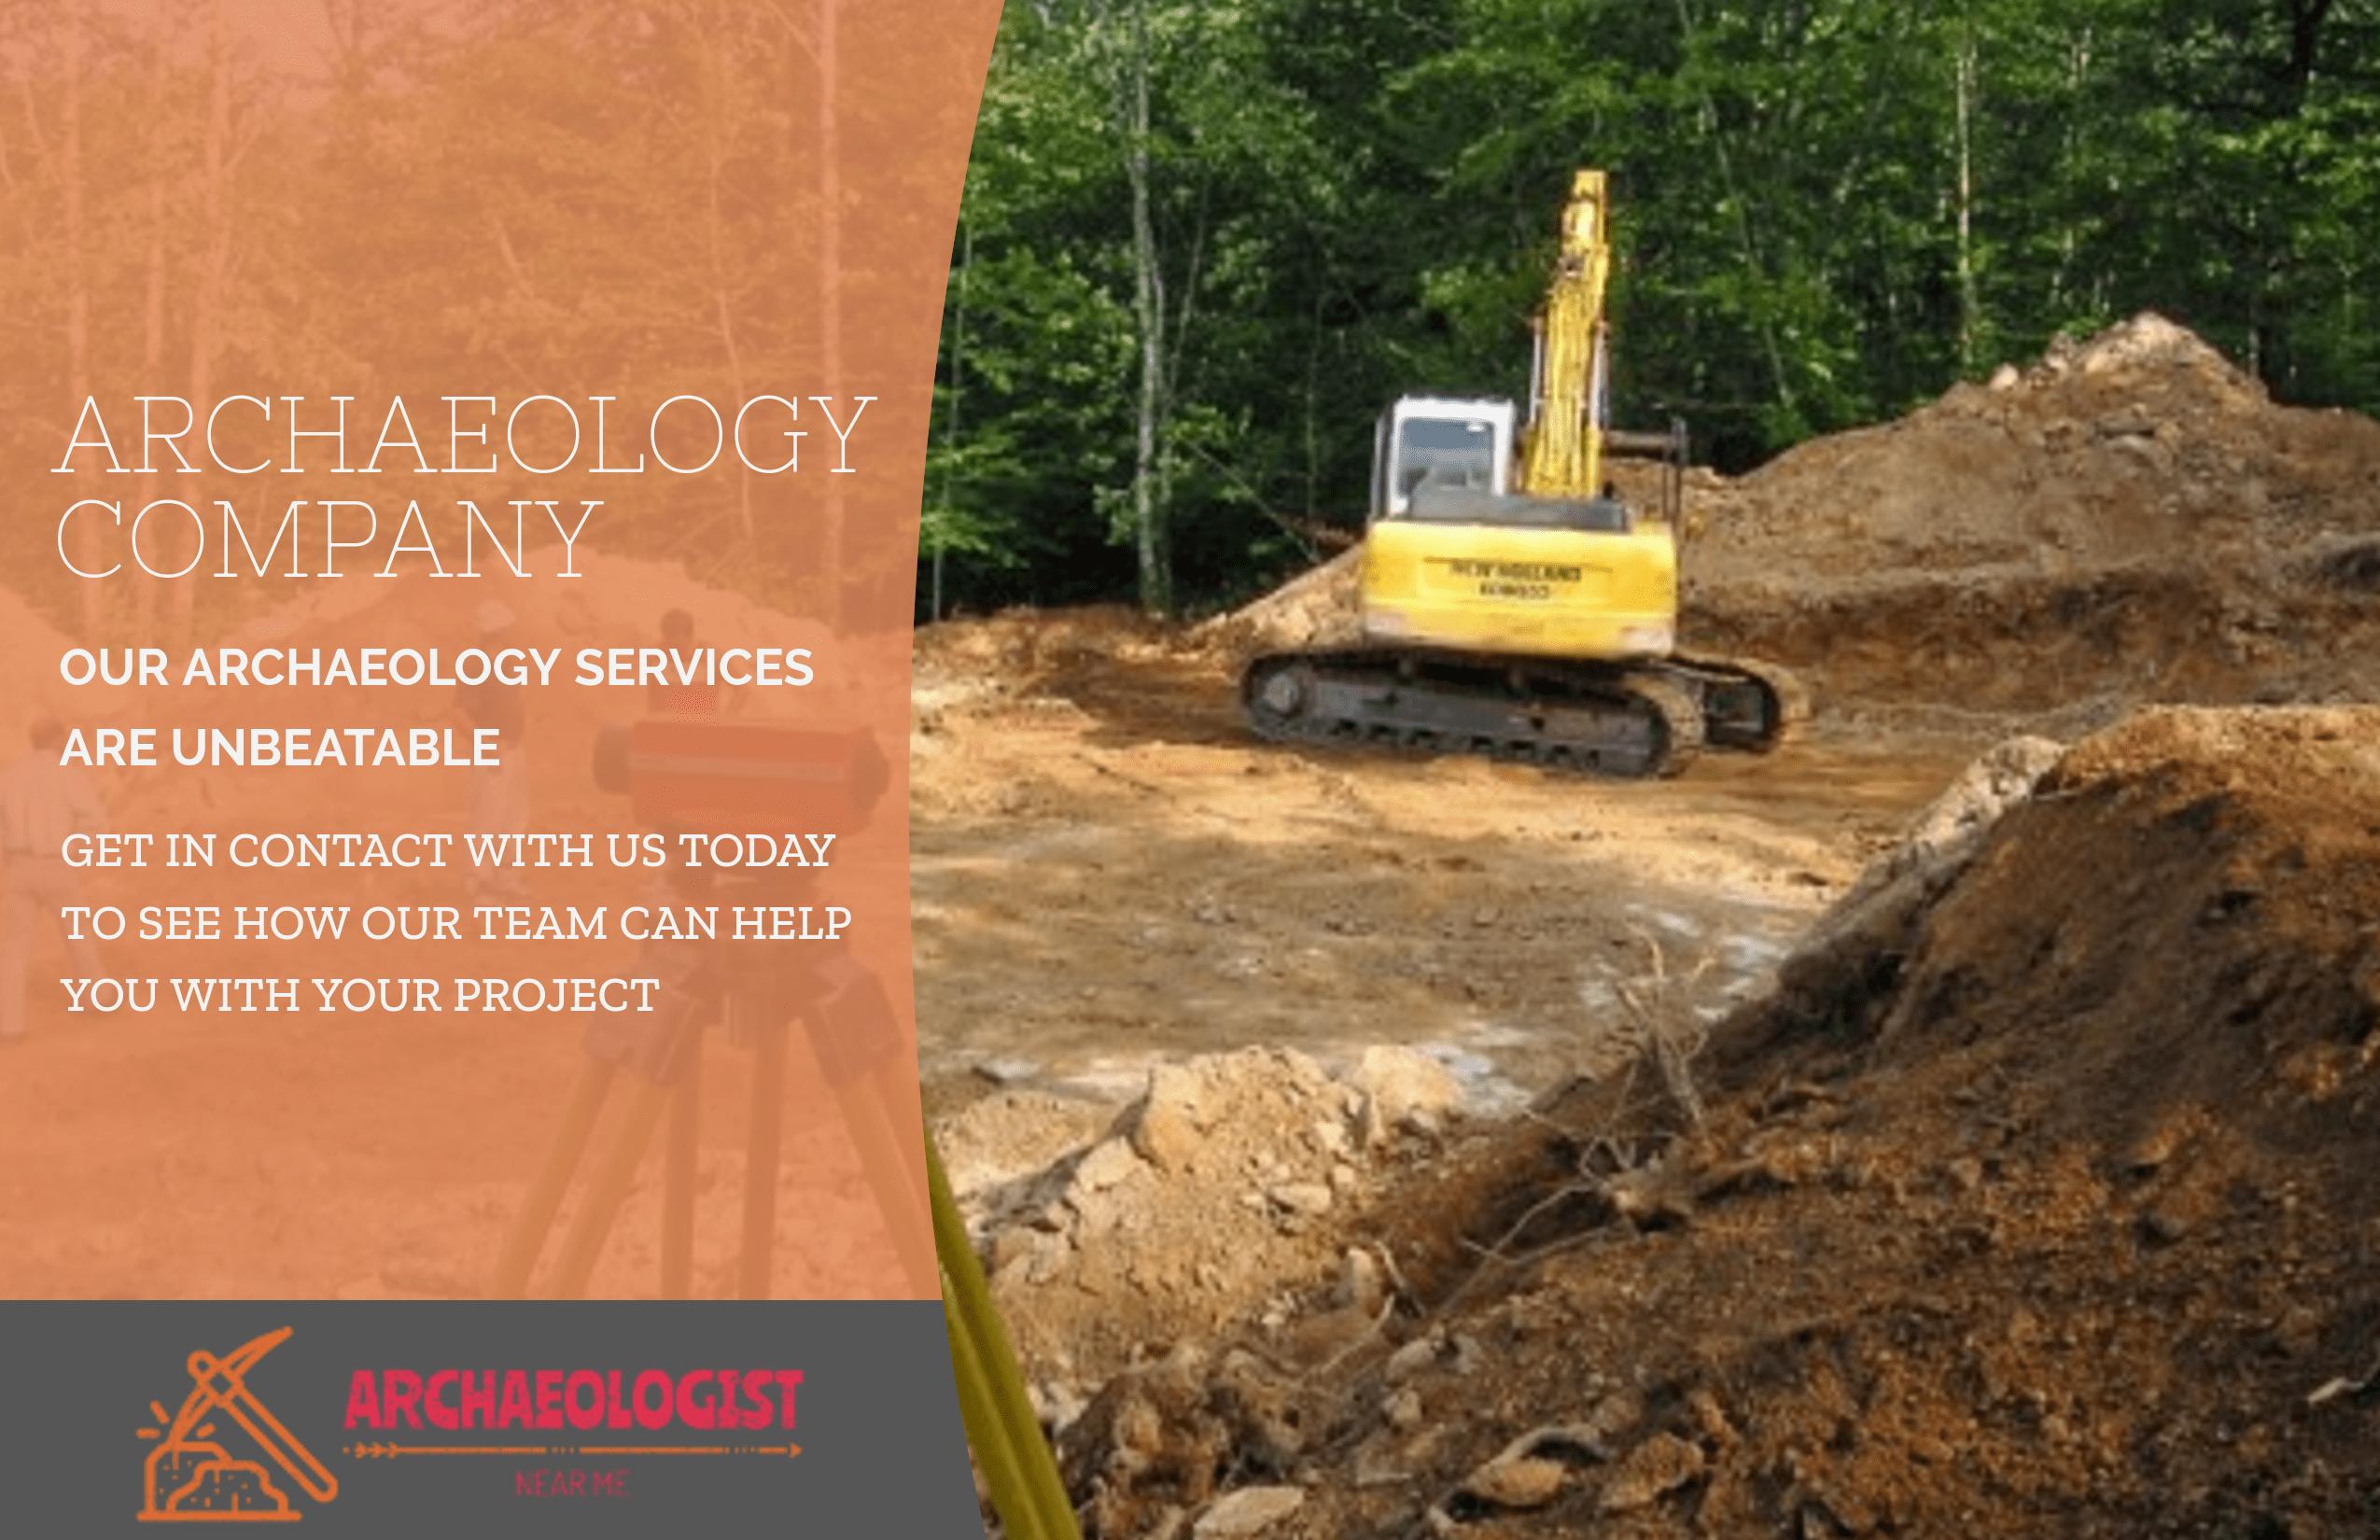 Archaeologist company